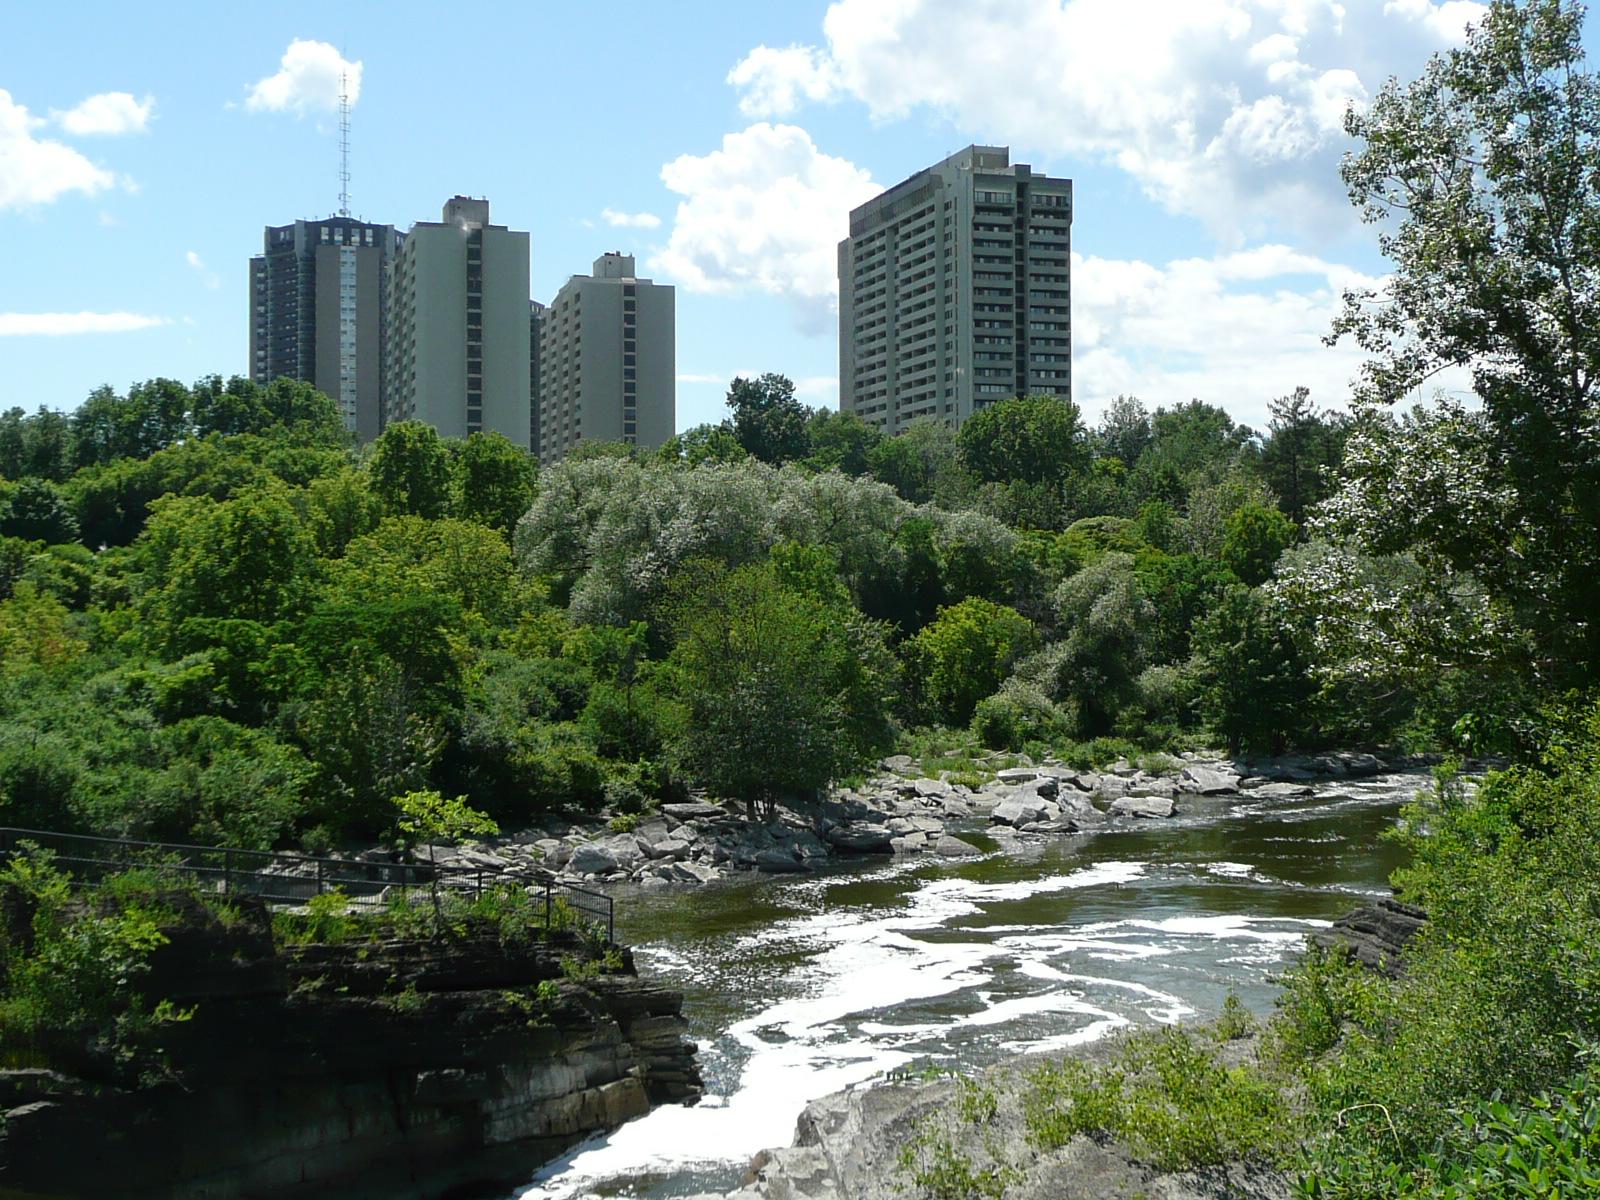 Rideau River in Hog's Back Park, Ottawa, ON